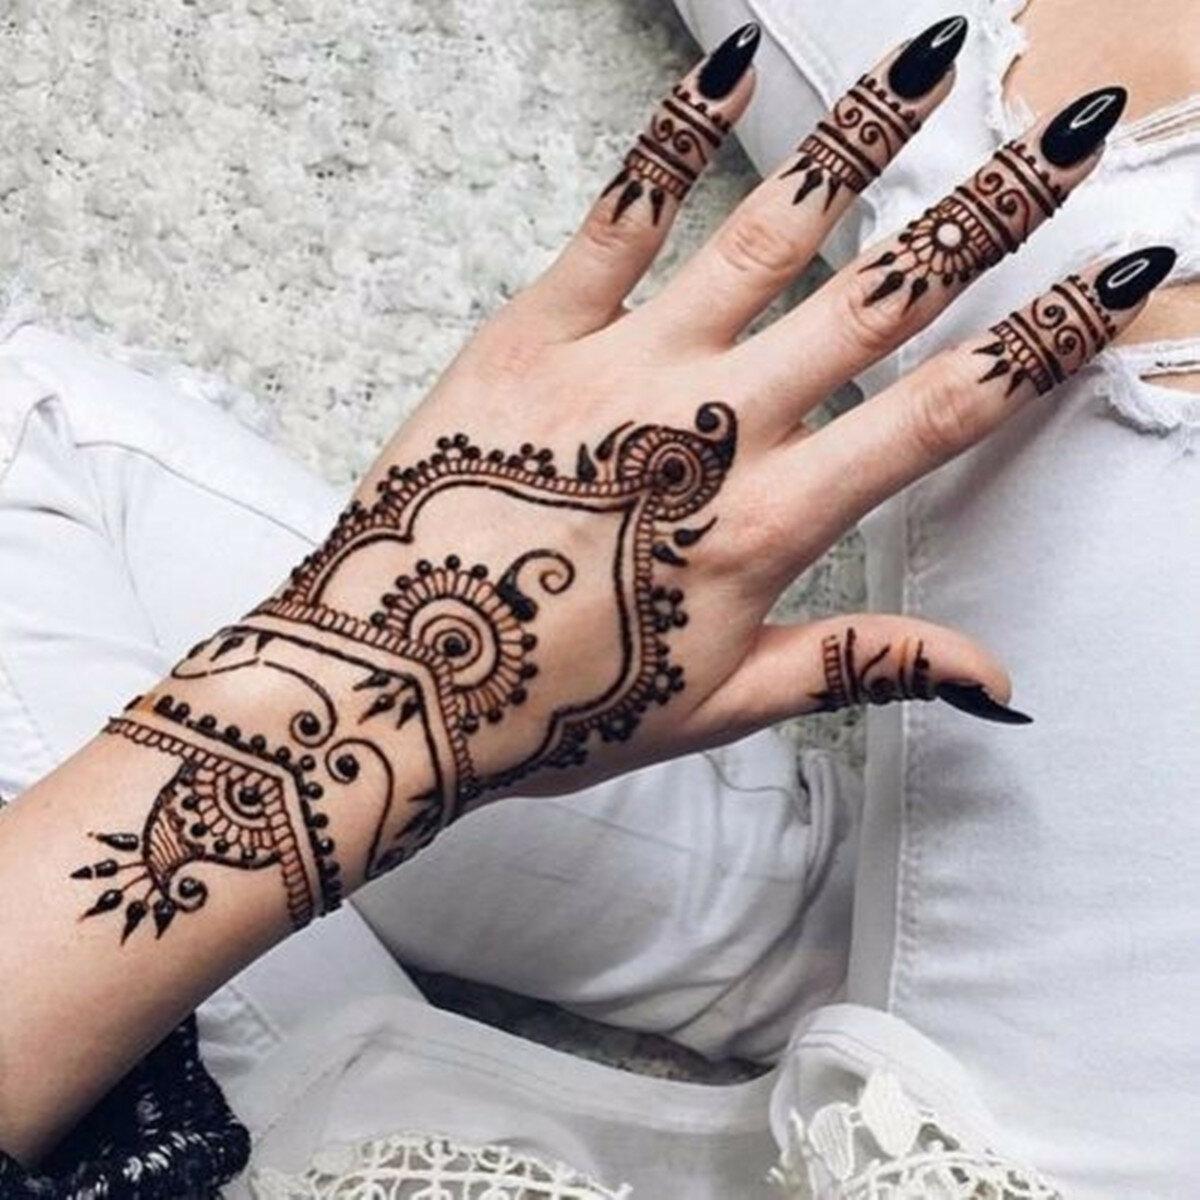 Temporary Black Henna Tattoo: Black Natural Squishy Herbal Henna Cone Temporary Tattoo